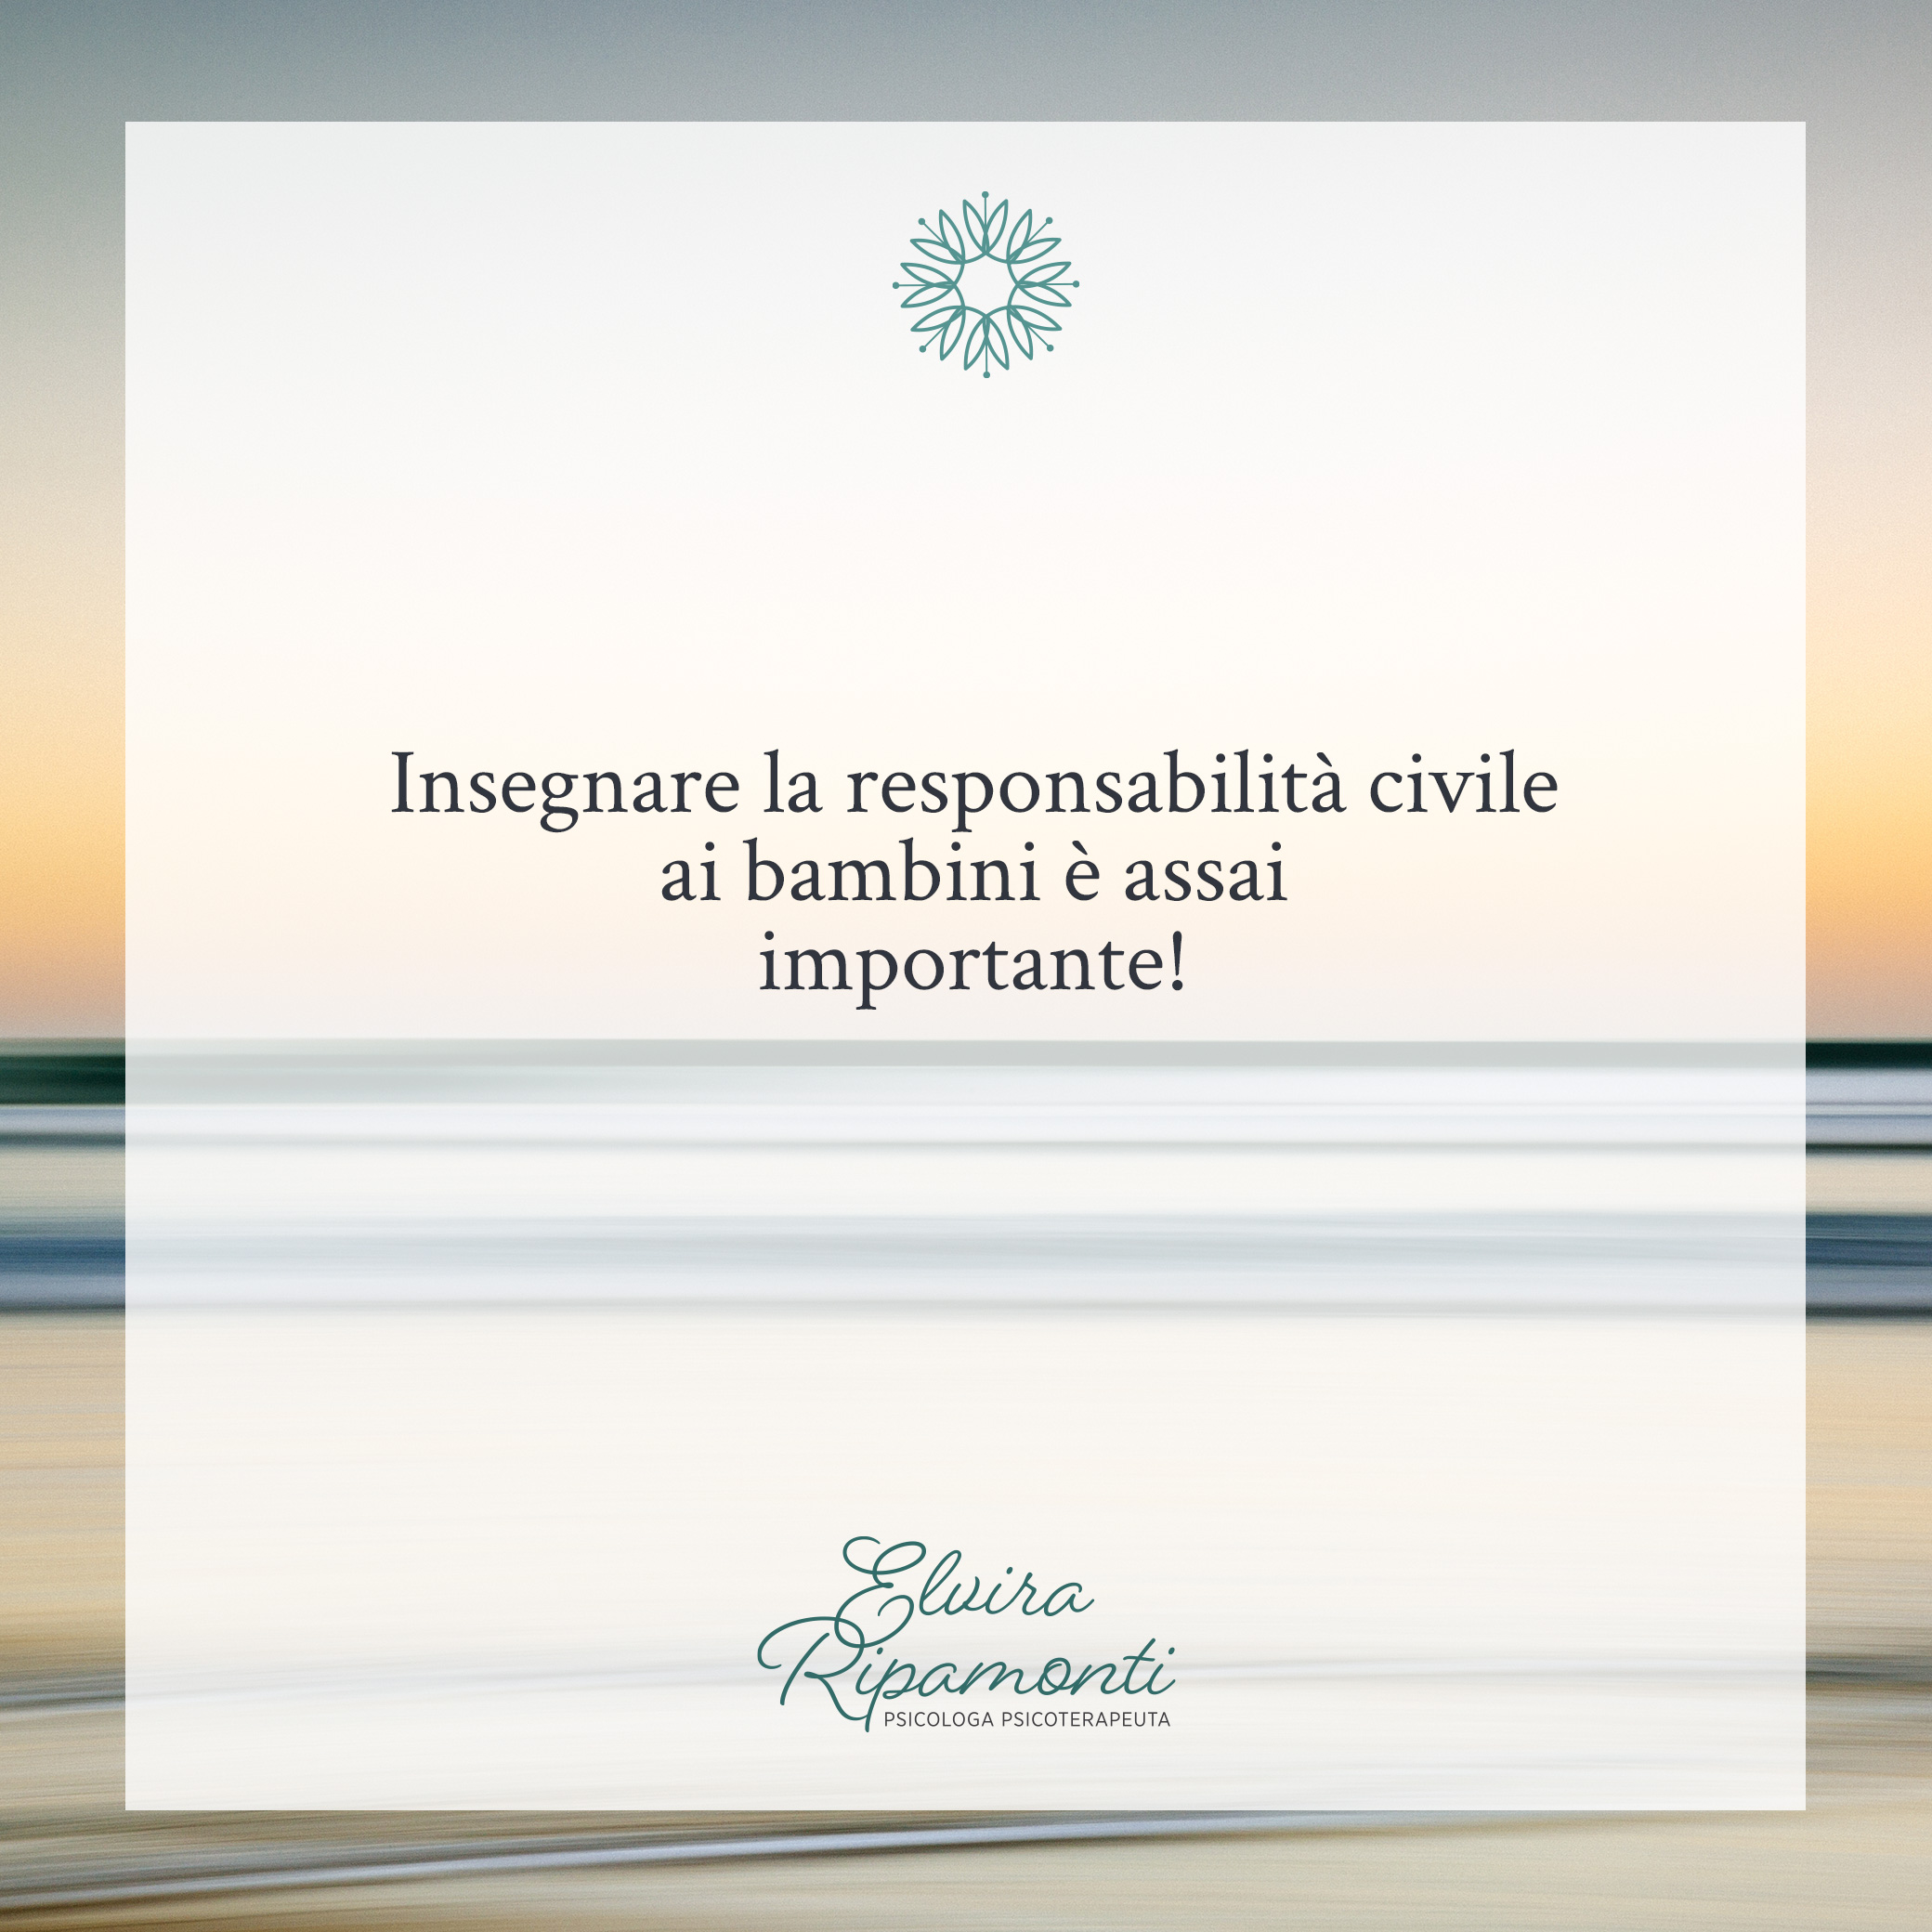 img responsabilità sociale